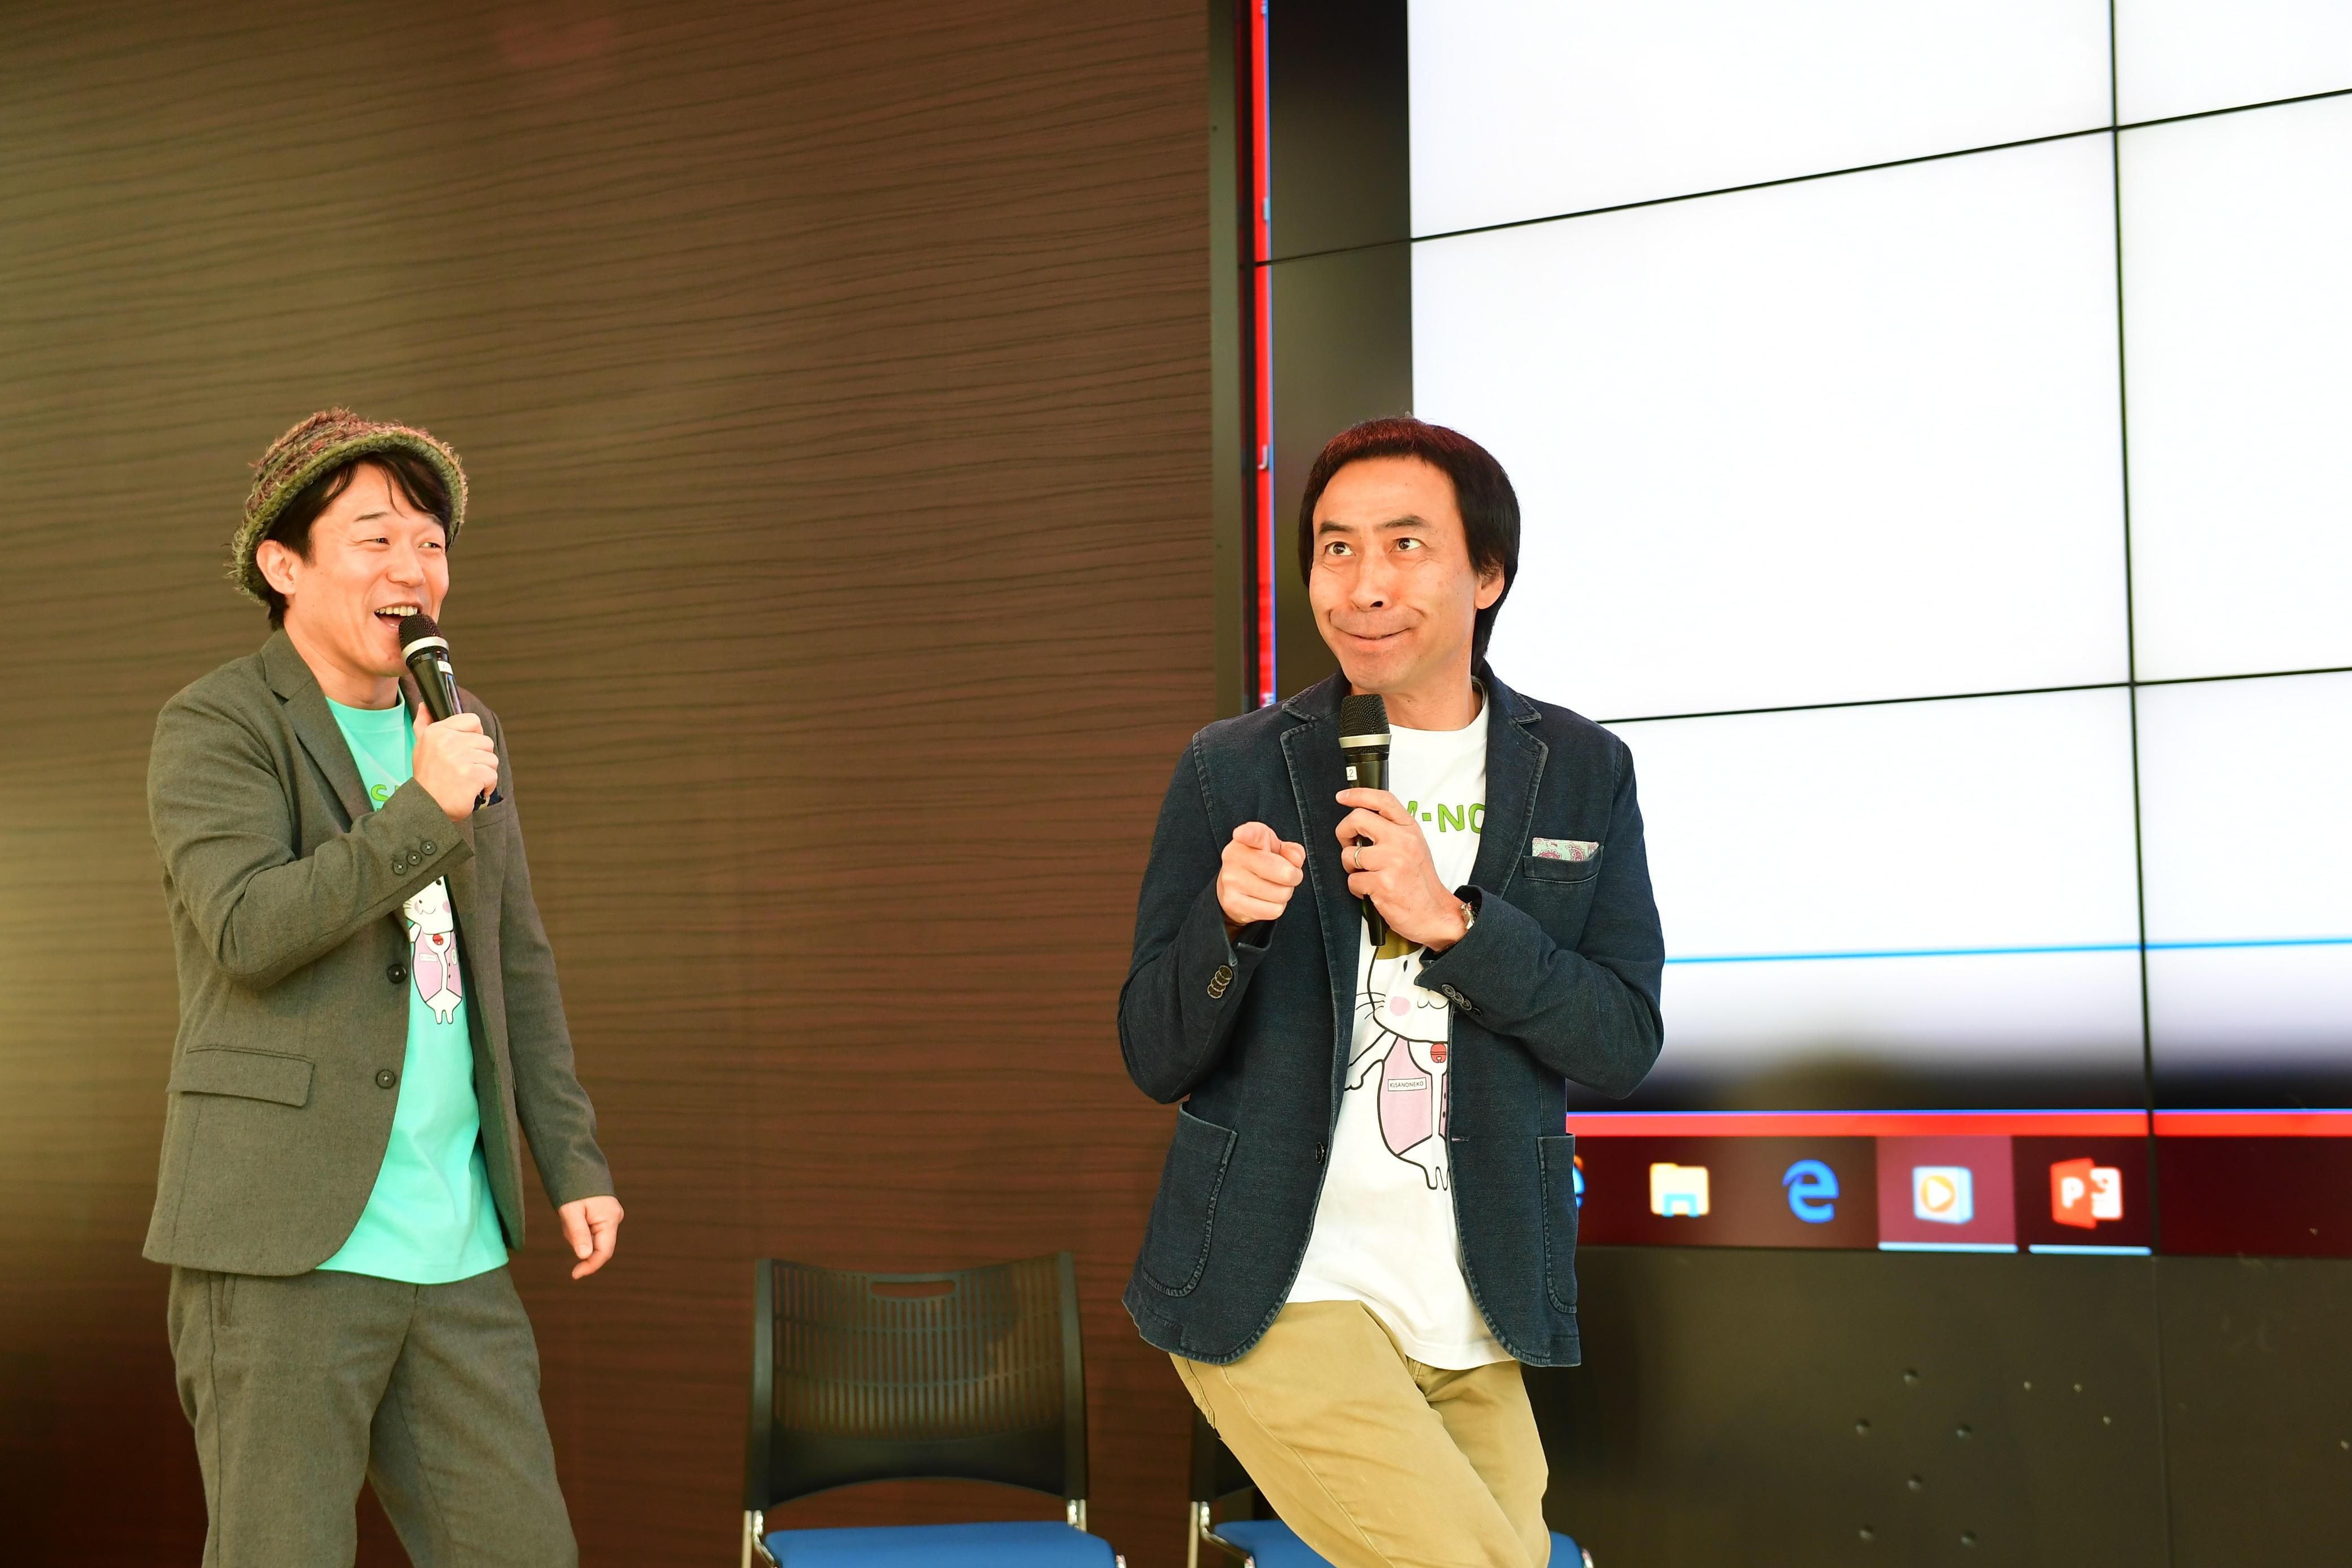 http://news.yoshimoto.co.jp/20190203131431-b472f04b4c4f83fc71b3421f146eb07907b970c5.jpg